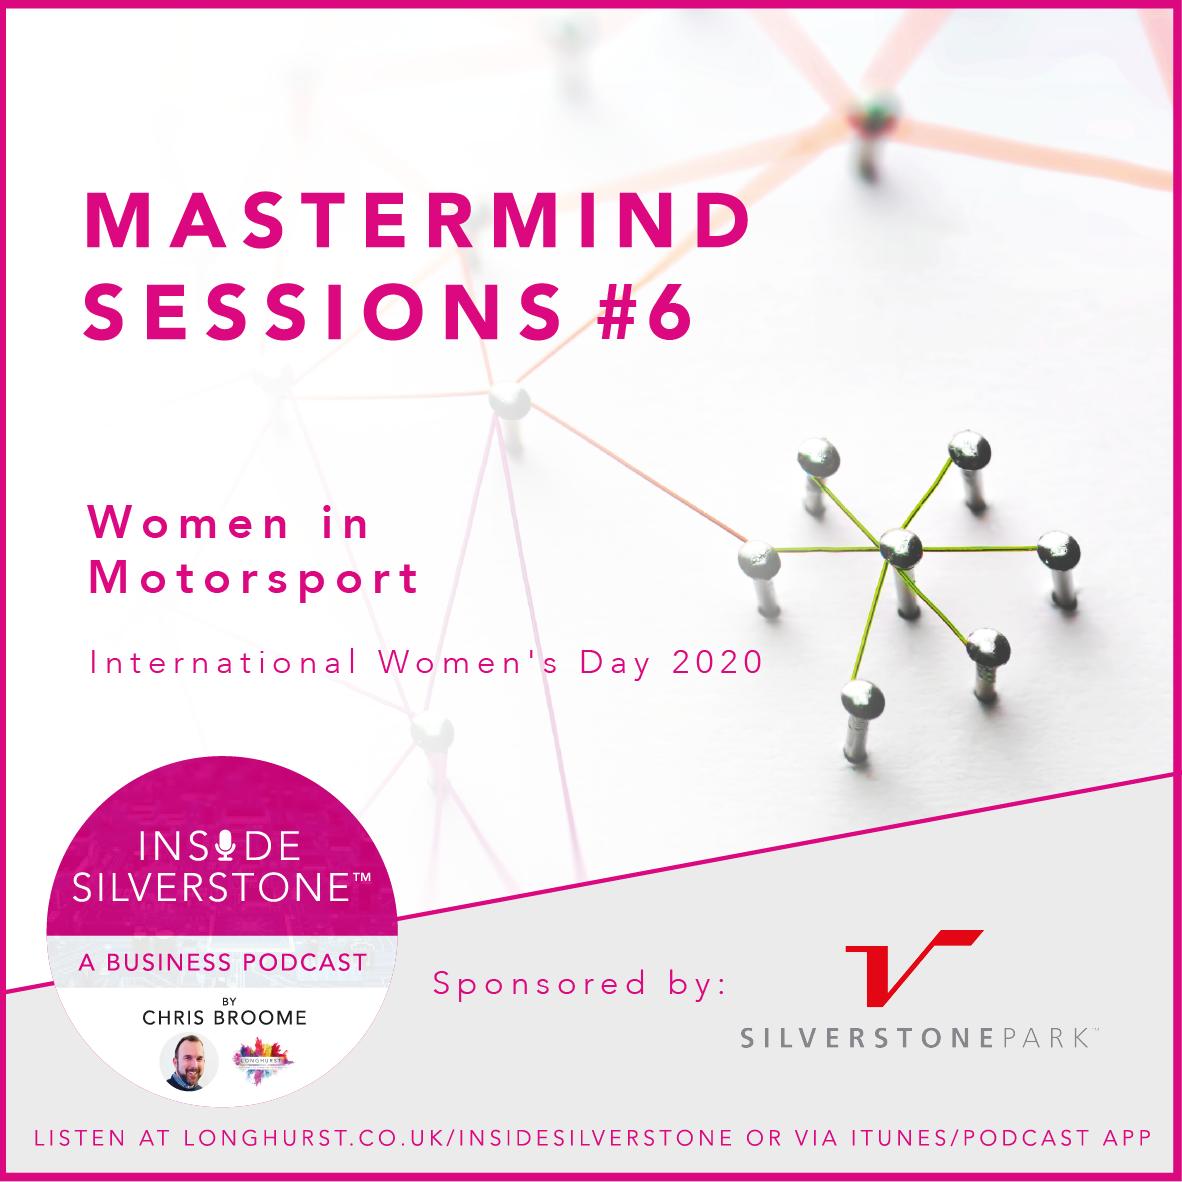 Mastermind Sessions #6'Women in Motorsport'